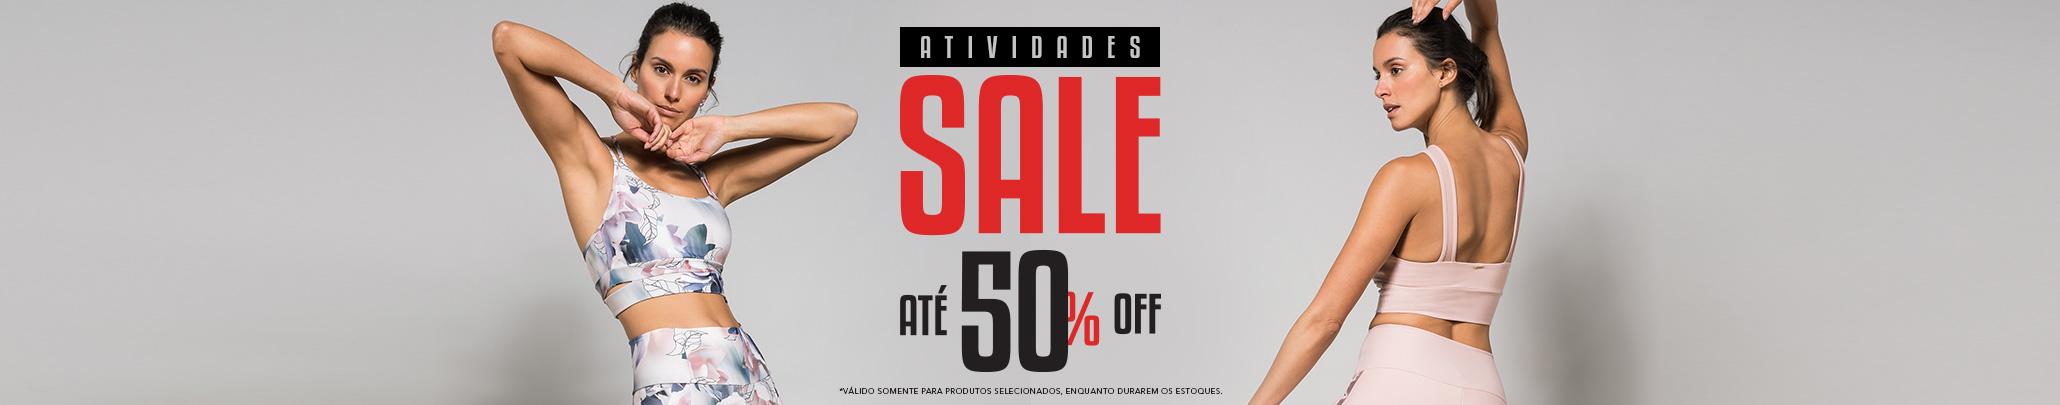 atividades-50%_DP_BR